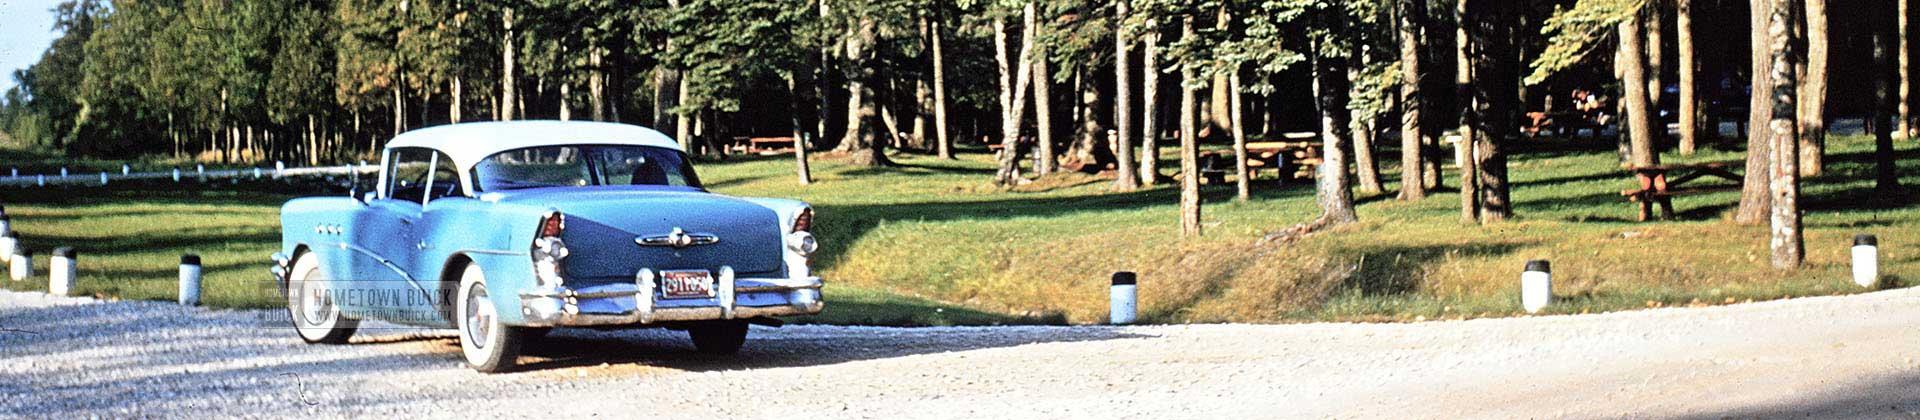 Buick Models Banner